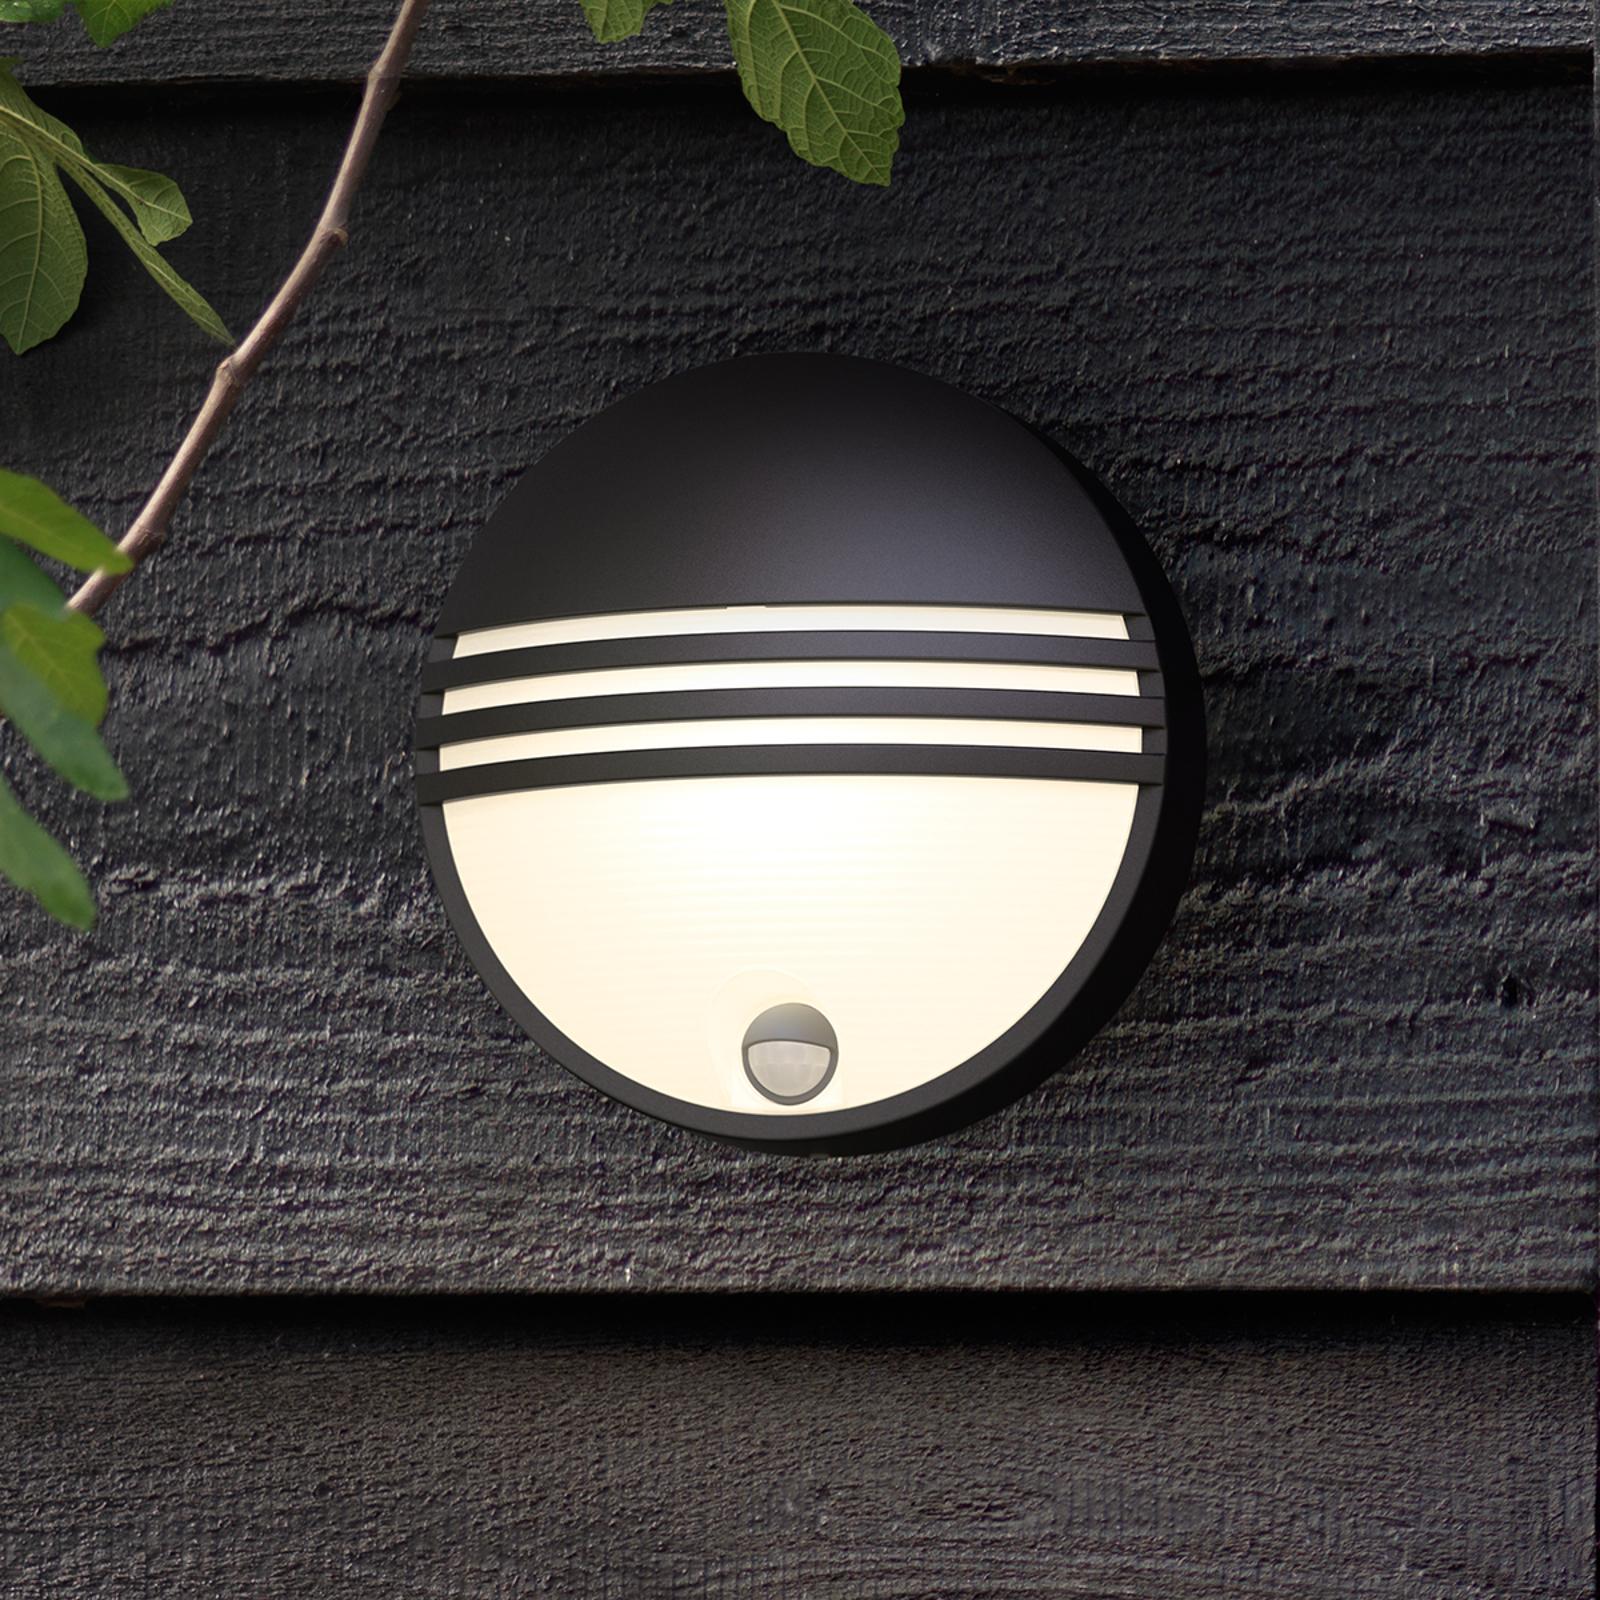 Philips Yarrow LED outdoor wall light with sensor_7531793_1